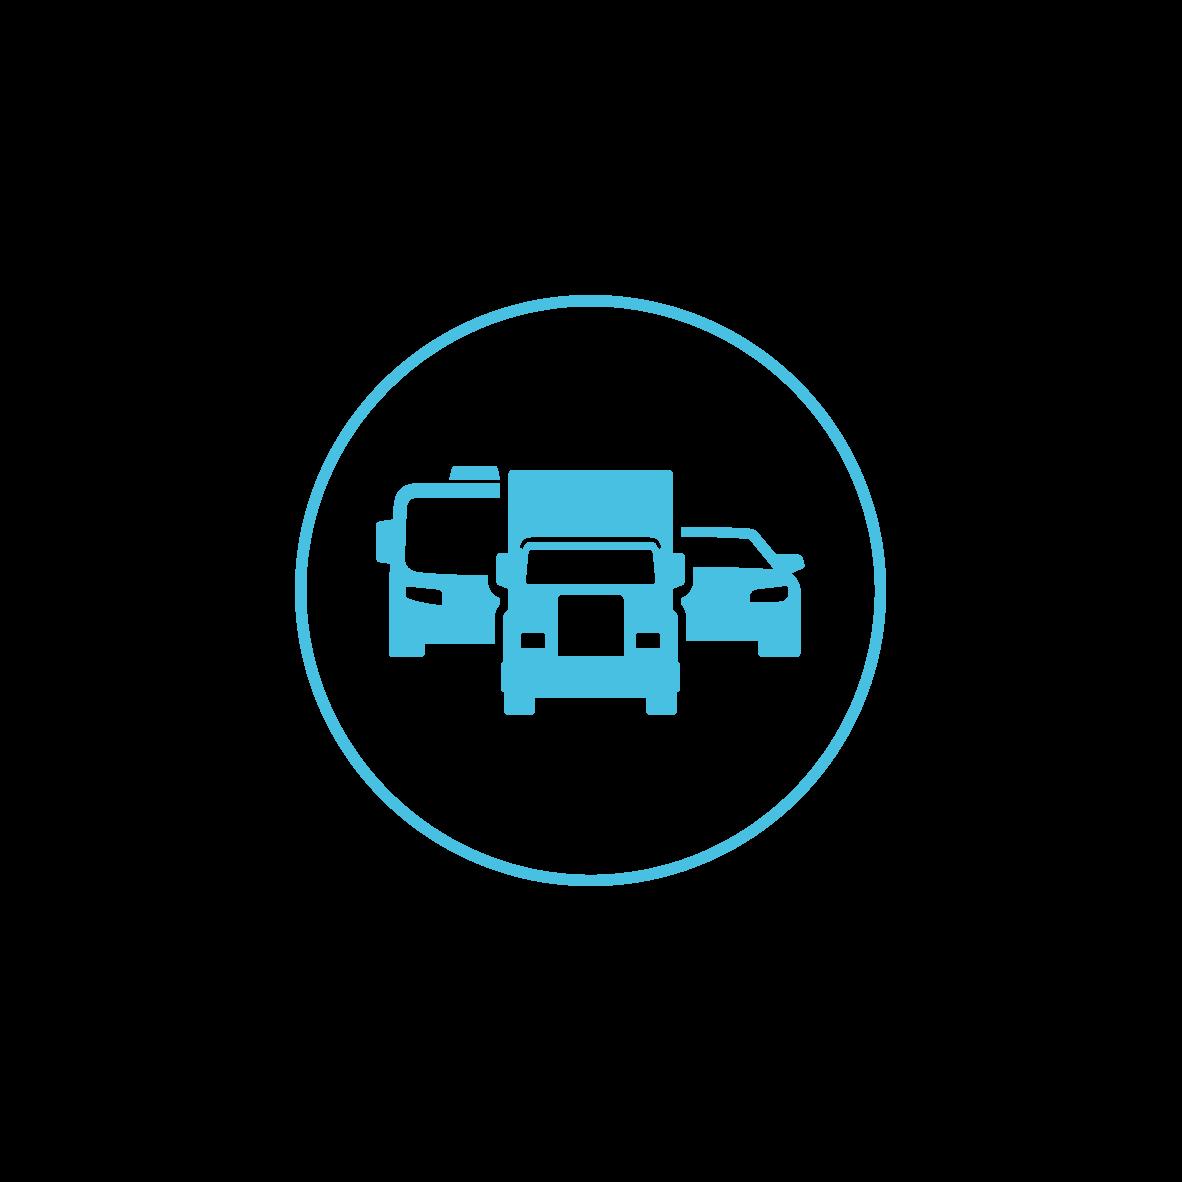 M297020-logos-FA-LB-01-vehicles